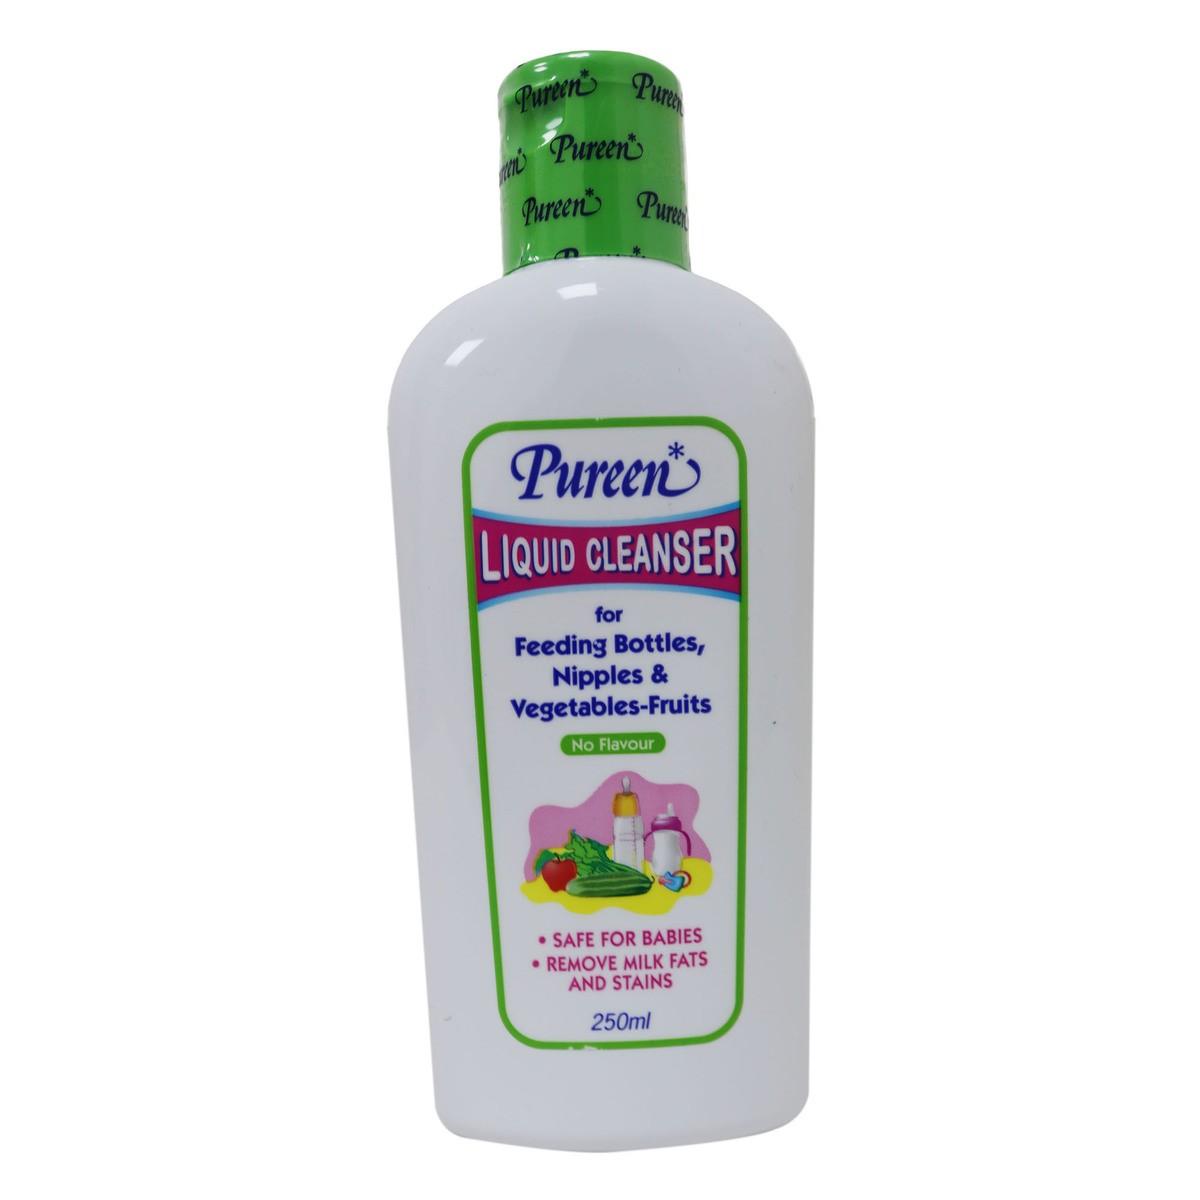 Pureen Liquid Cleanser No Flavour (250ml) - Kico Baby Center